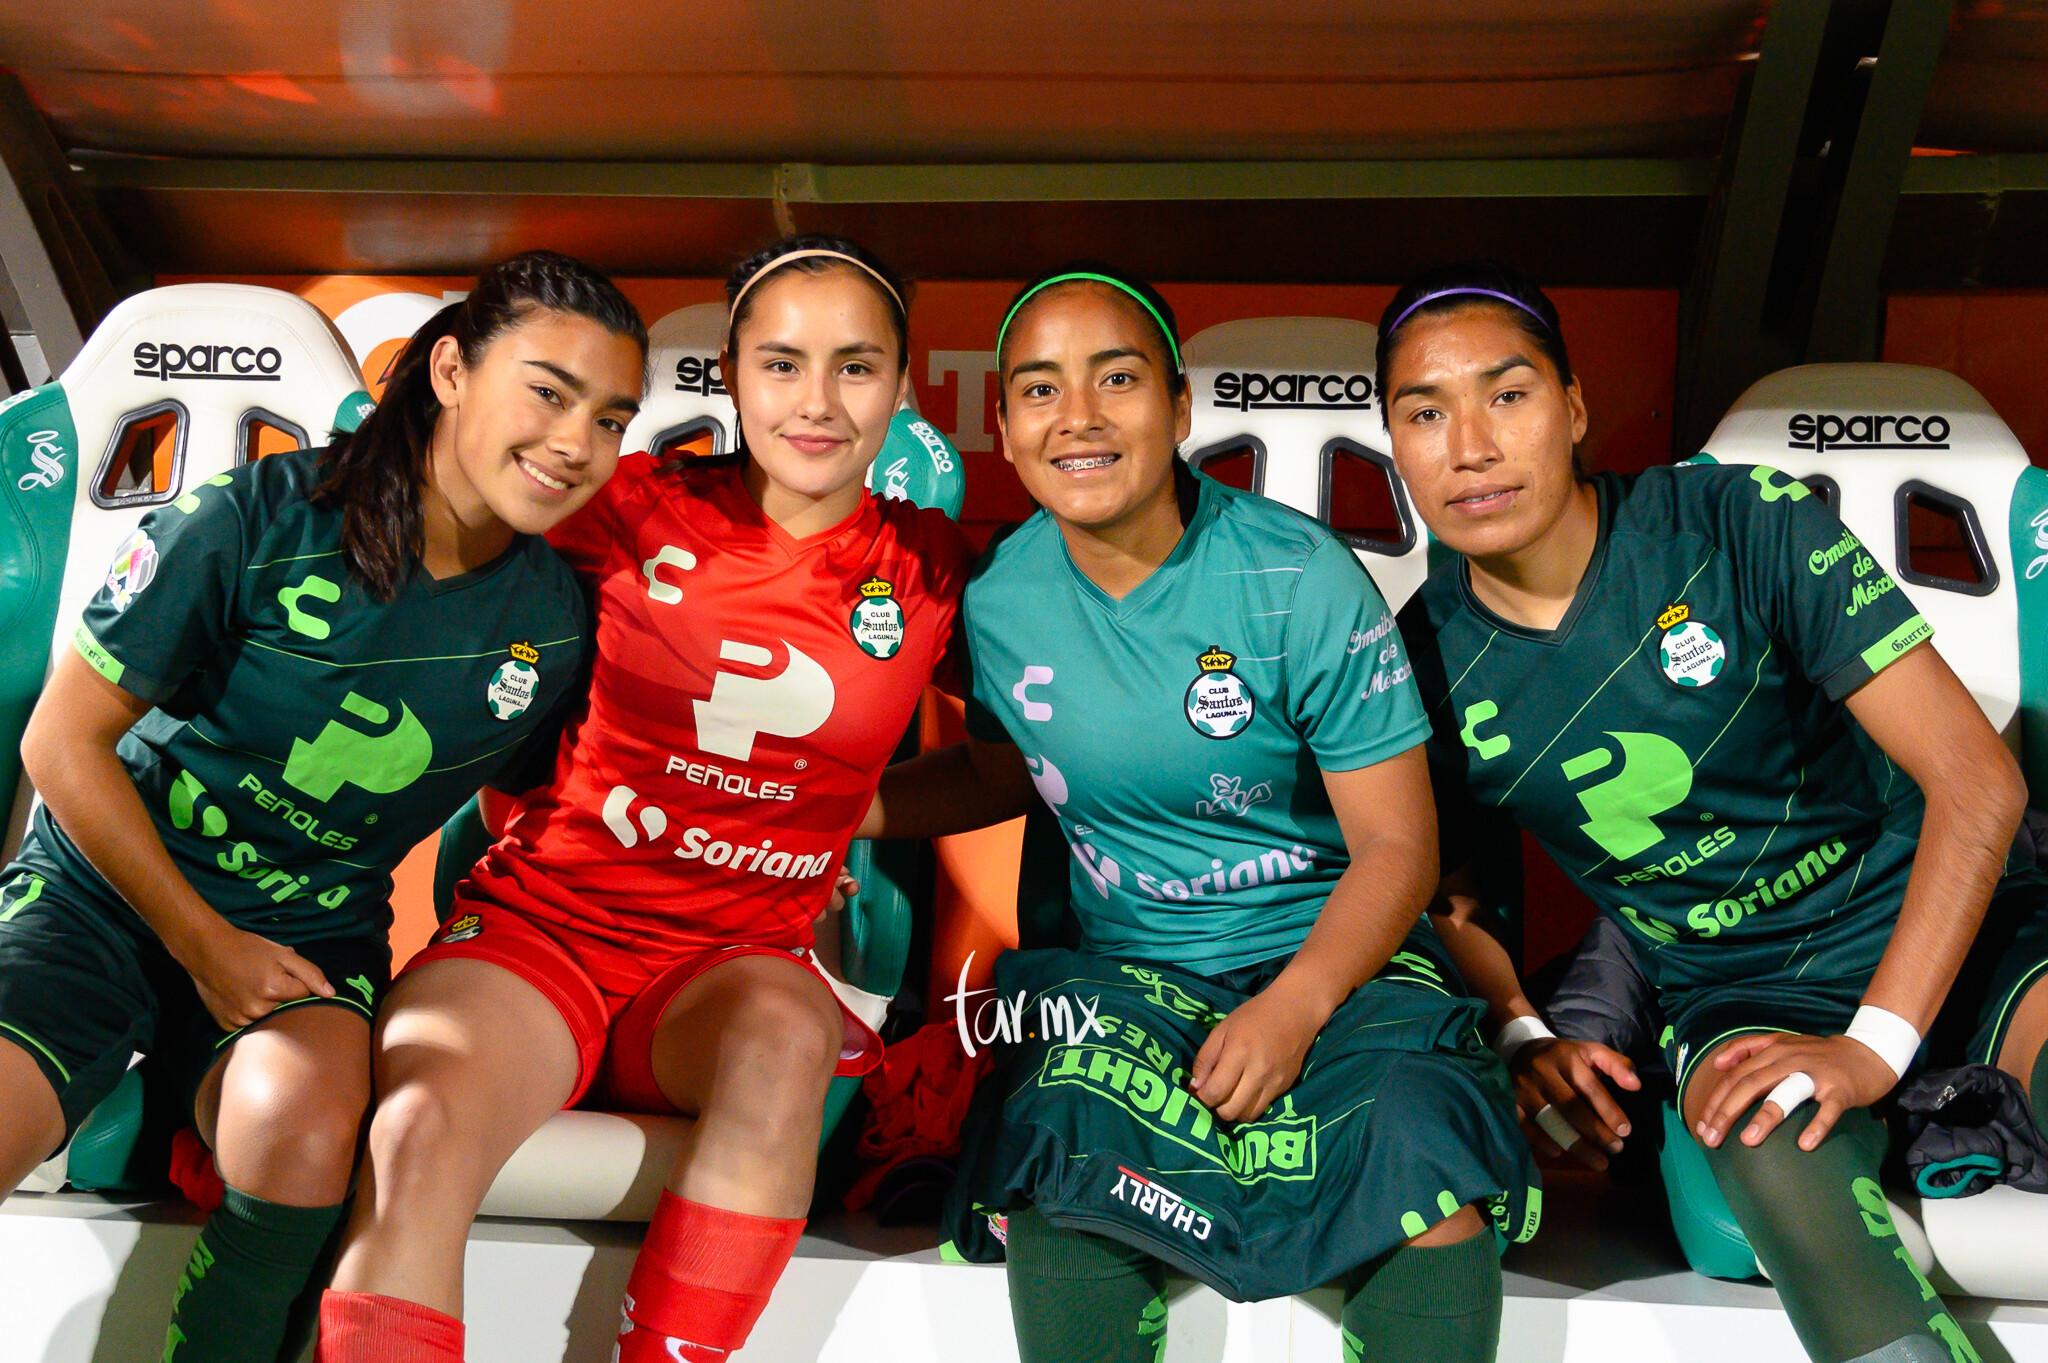 Yahaira Flores, Paola Calderón, Marianne Martínez